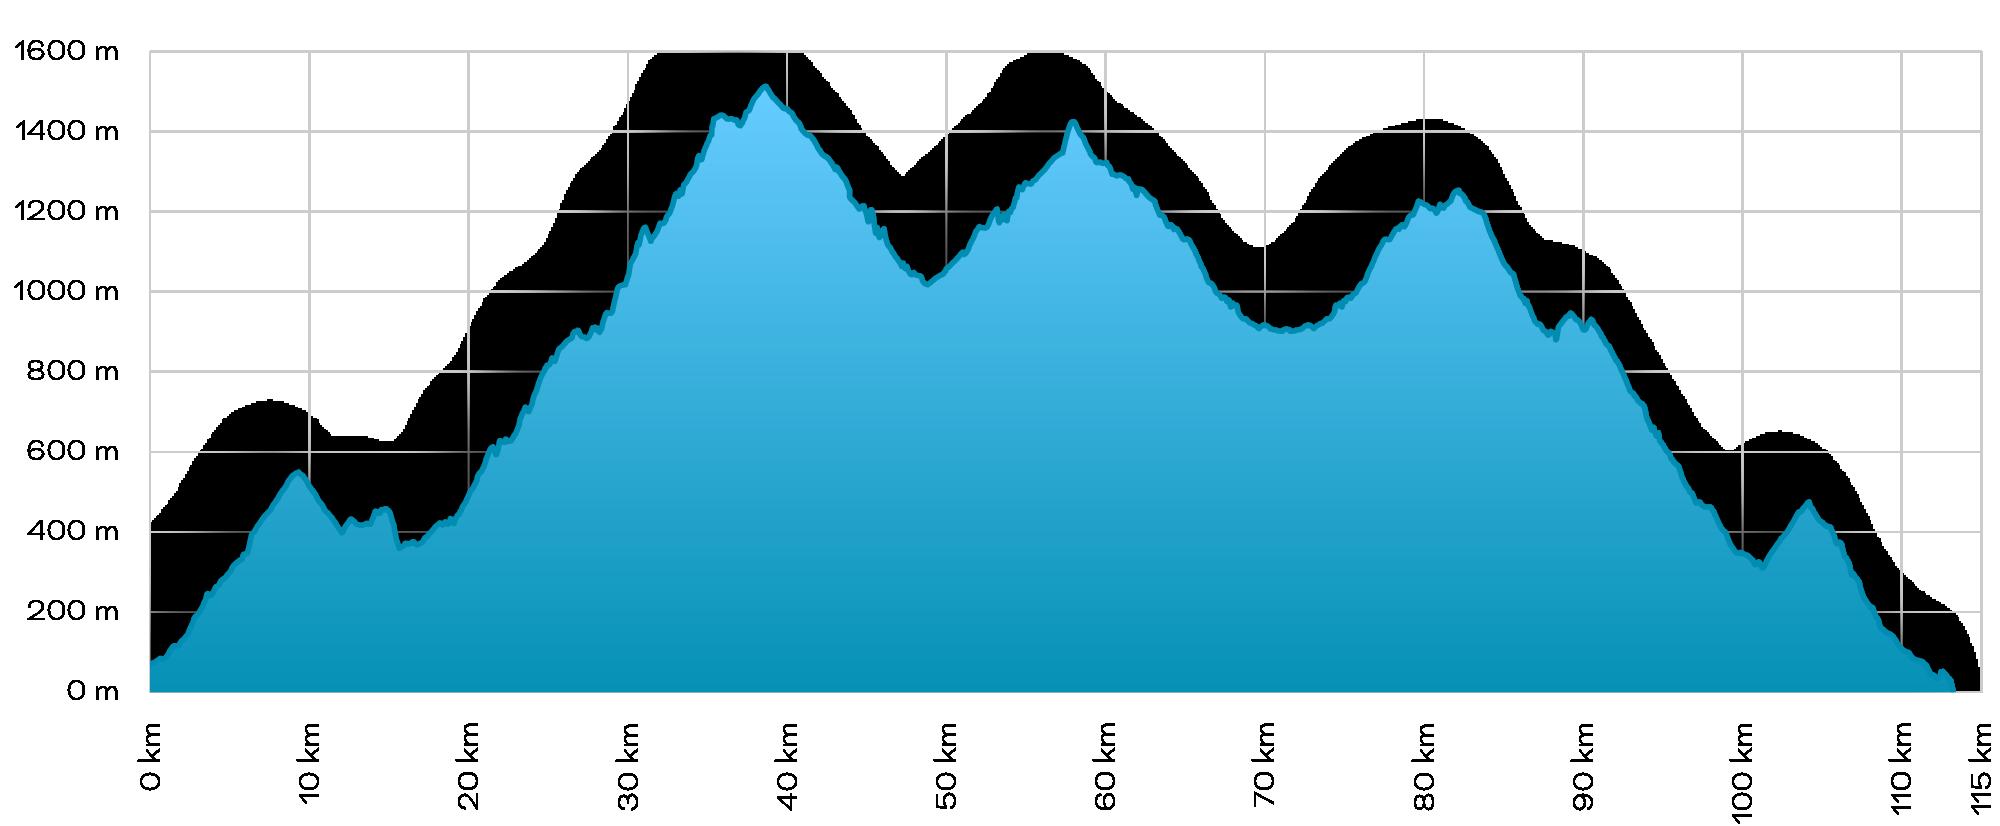 Bandama Volcano - Elevation profile